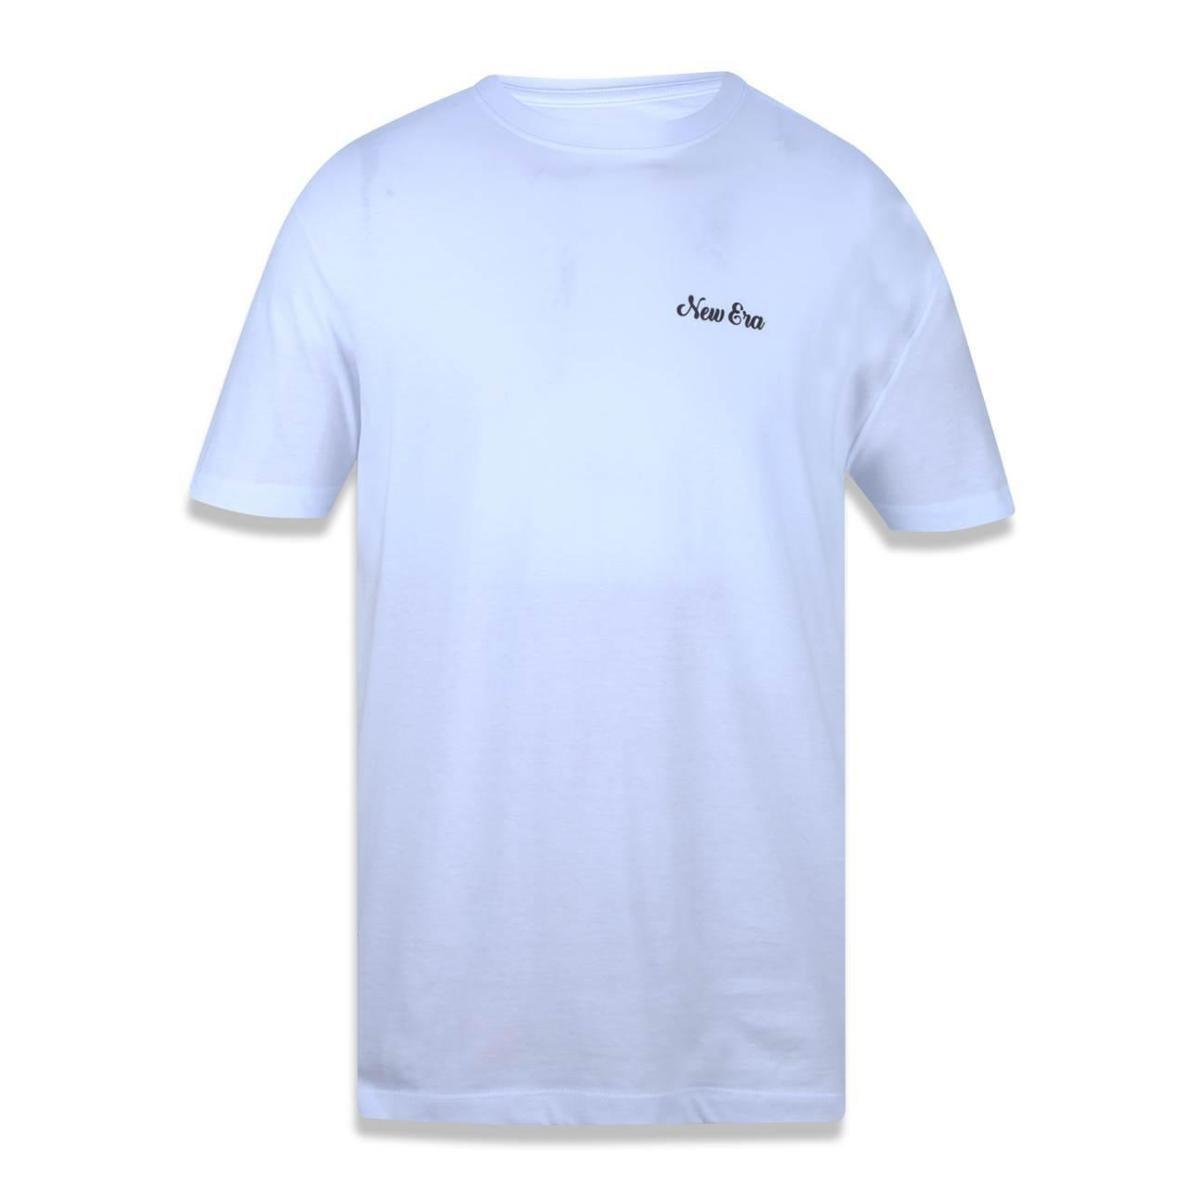 0c50ffe514f13 Camiseta Branded New Era Masculina - Compre Agora